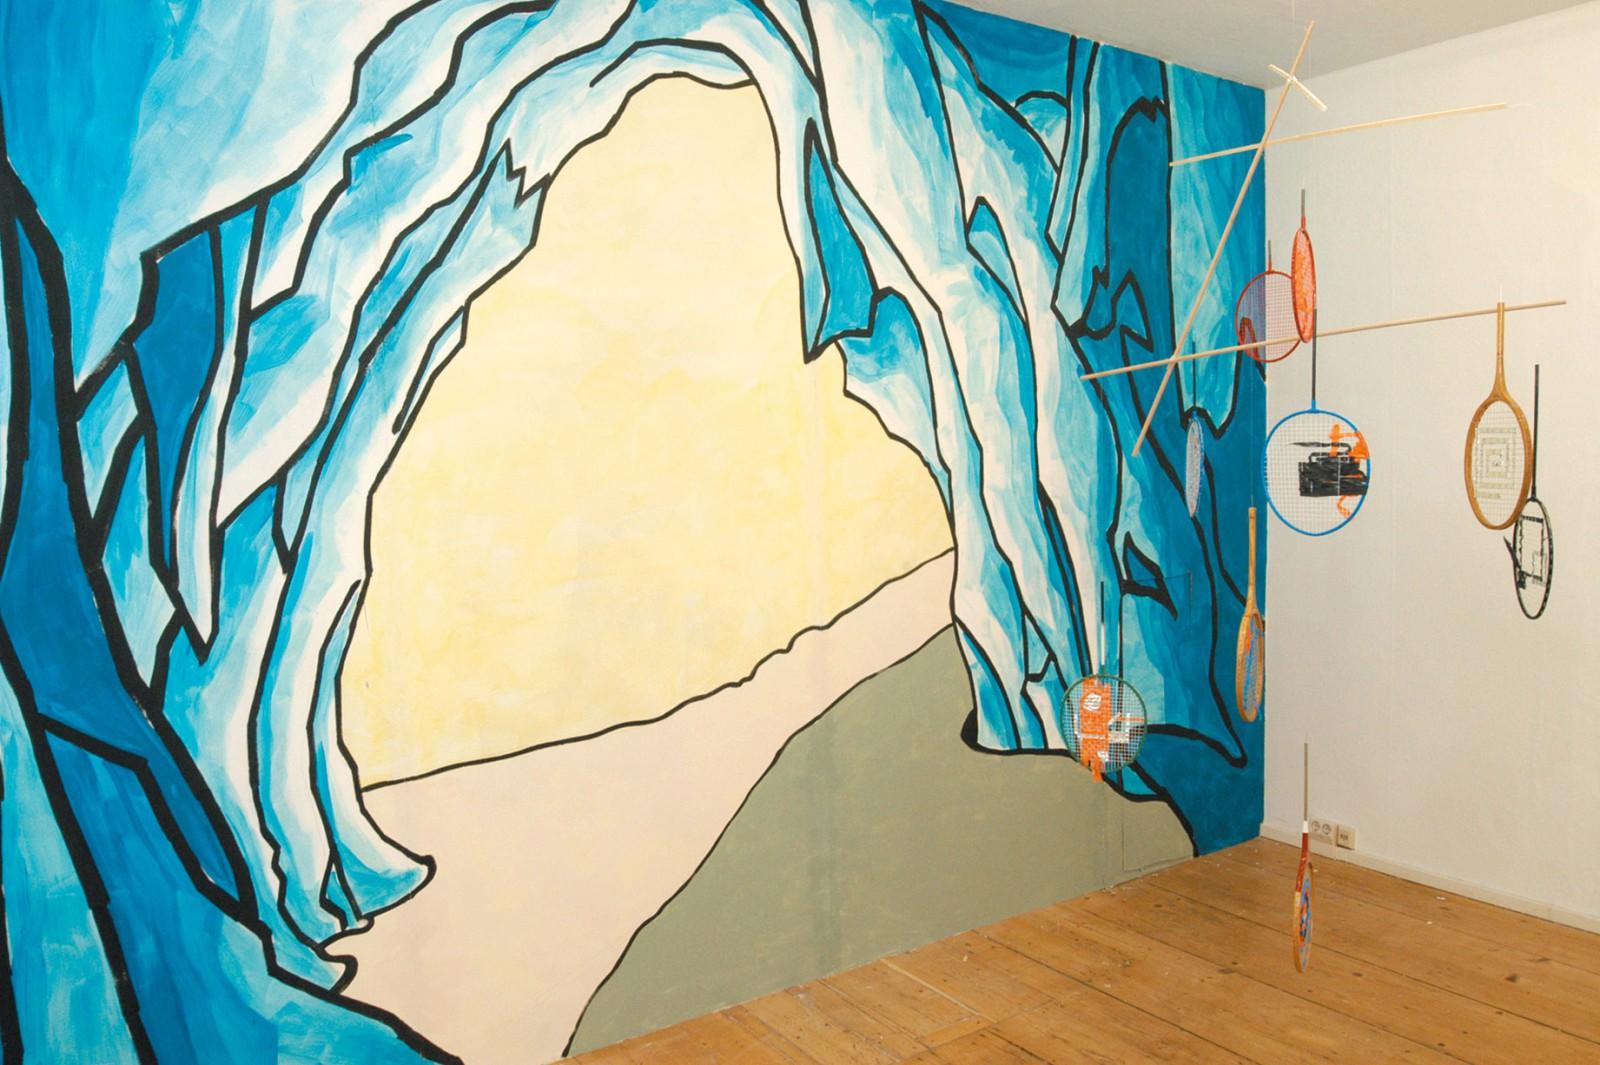 Kim Nekarda: Untitled, 2004, wall painting, Reuter, Tharandterstrasse 19, Dresden,Alexander Wolff, Mandla Reuter